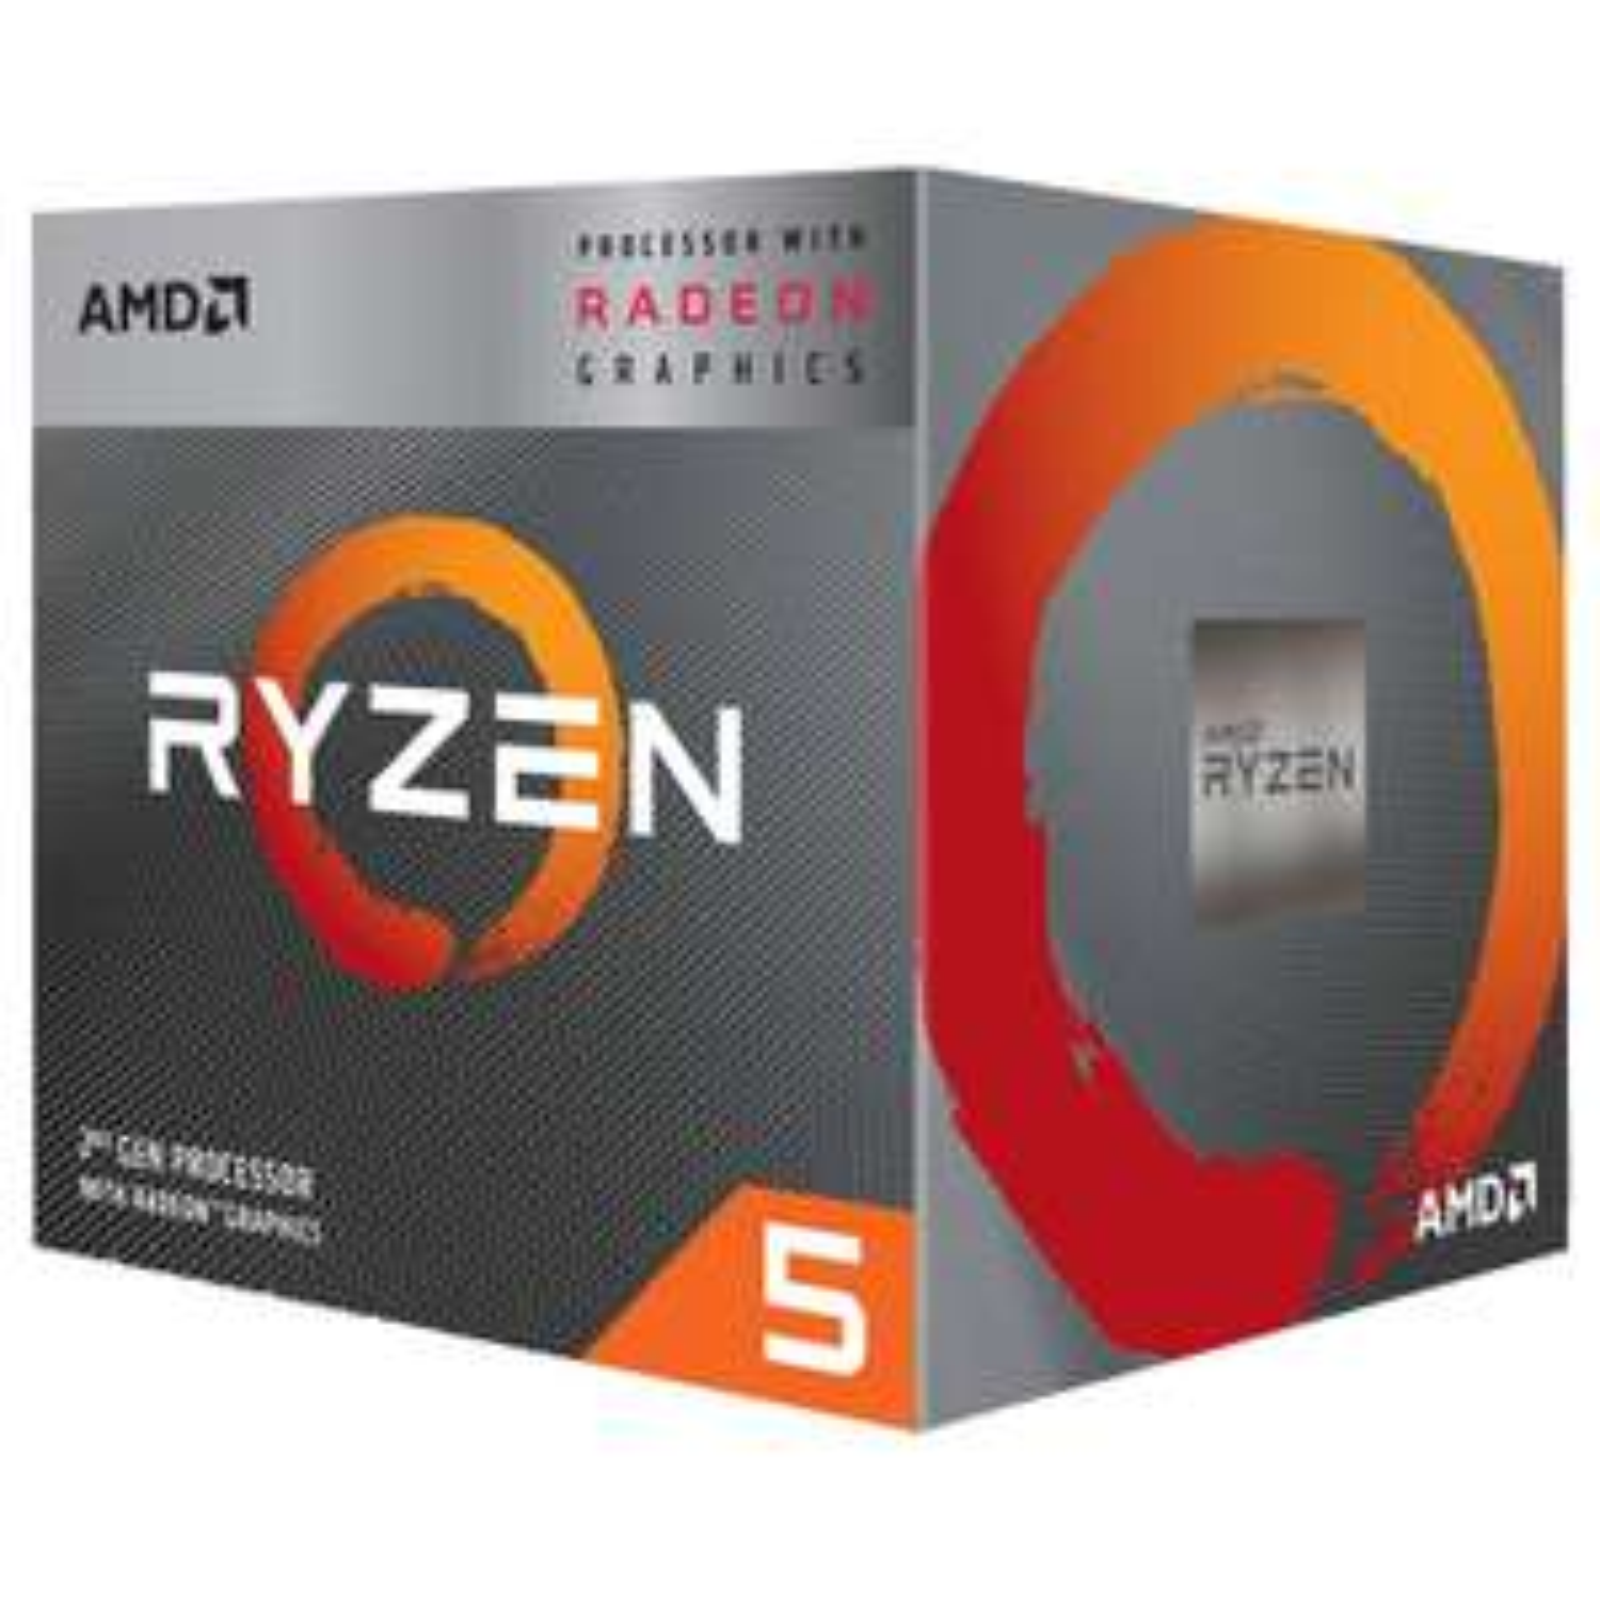 Processeur AMD Ryzen 5 3400G (4C / 8T, 6 Mo de cache, 4,2 GHz Max Boost) / RX Vega 11